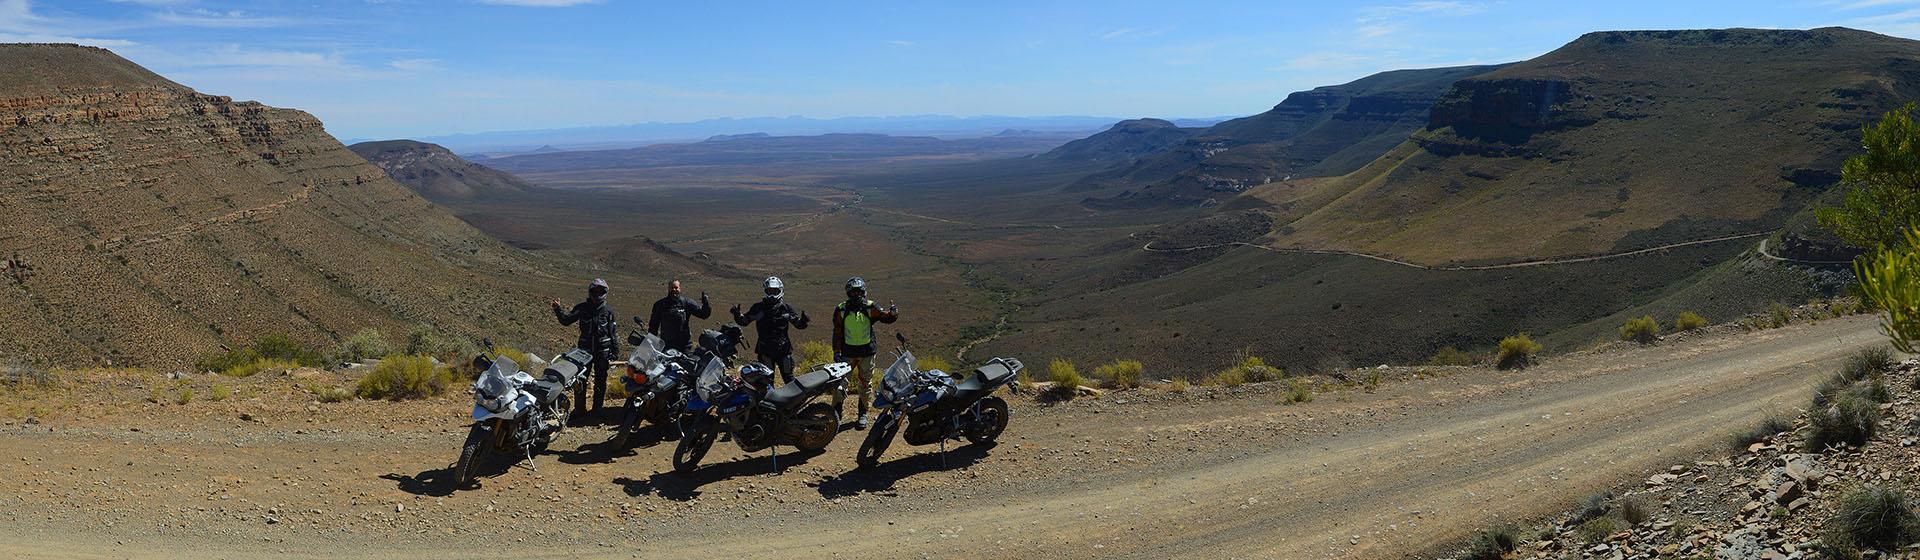 Ganaga Pass, Tankwa Karoo